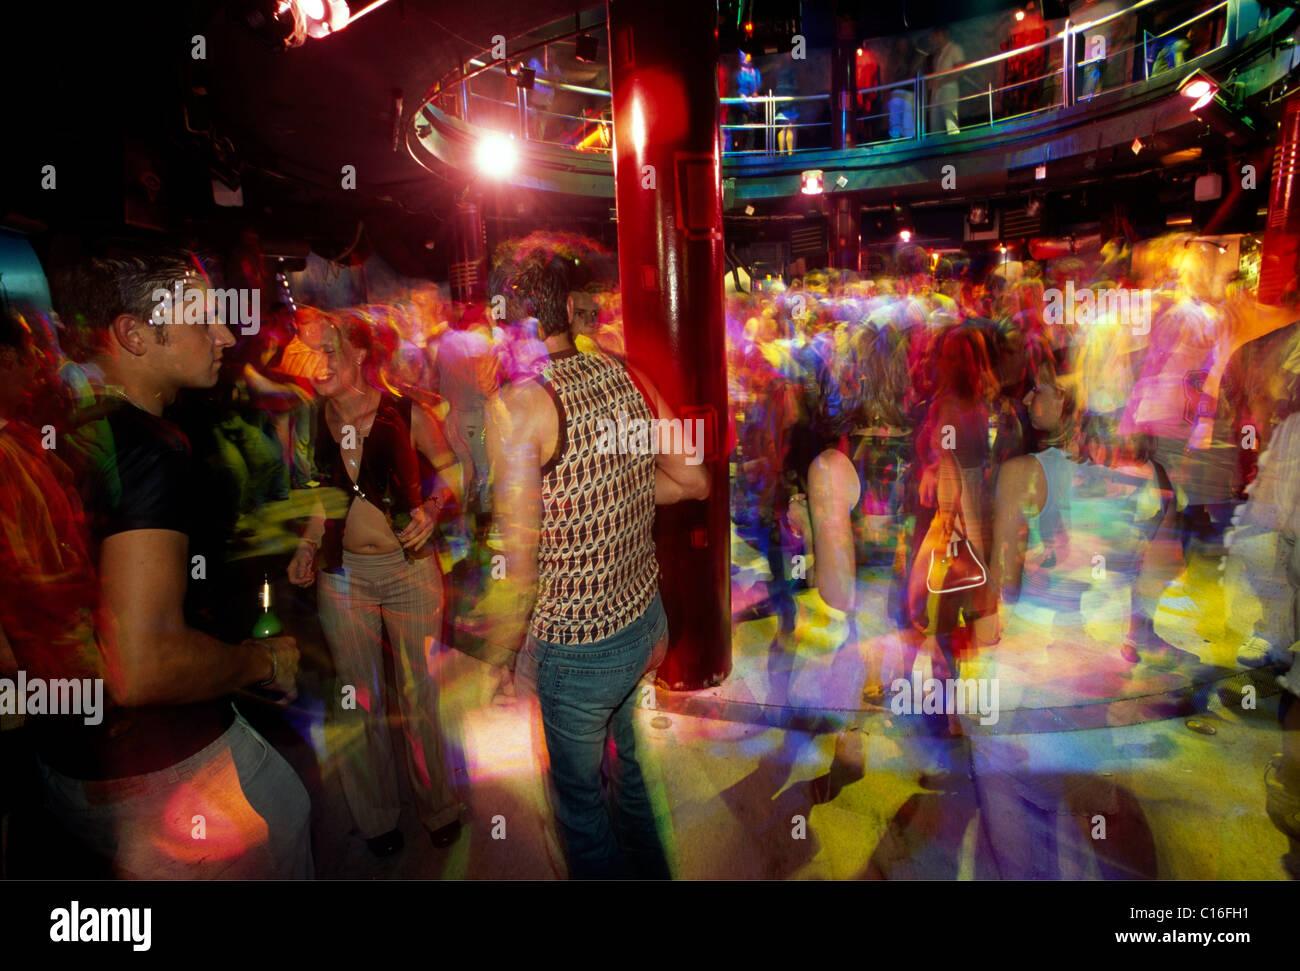 Discoteca Palace a Siofok al Lago Balaton, Ungheria, Europa Immagini Stock